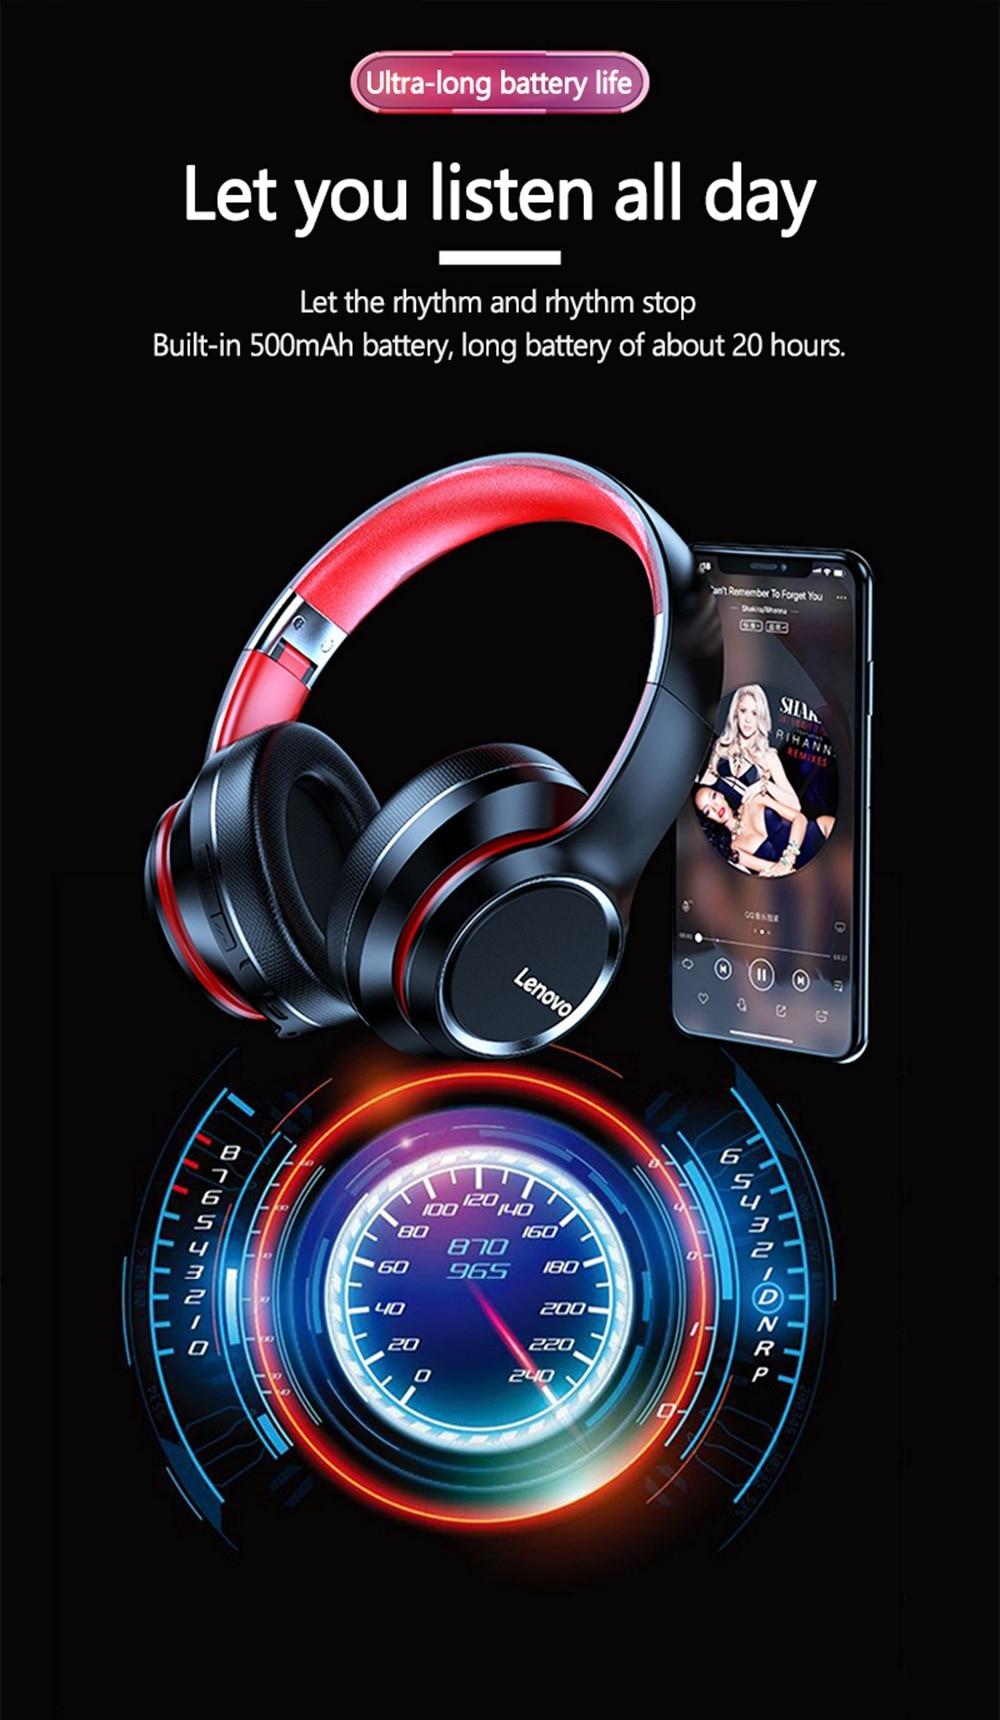 Lenovo HD200 Bluetooth Draadloze Stereo Hoofdtelefoon BT5.0 Lange Standby Leven Met Noise Cancelling Voor Xiaomi Iphone Lenovo Headset 16